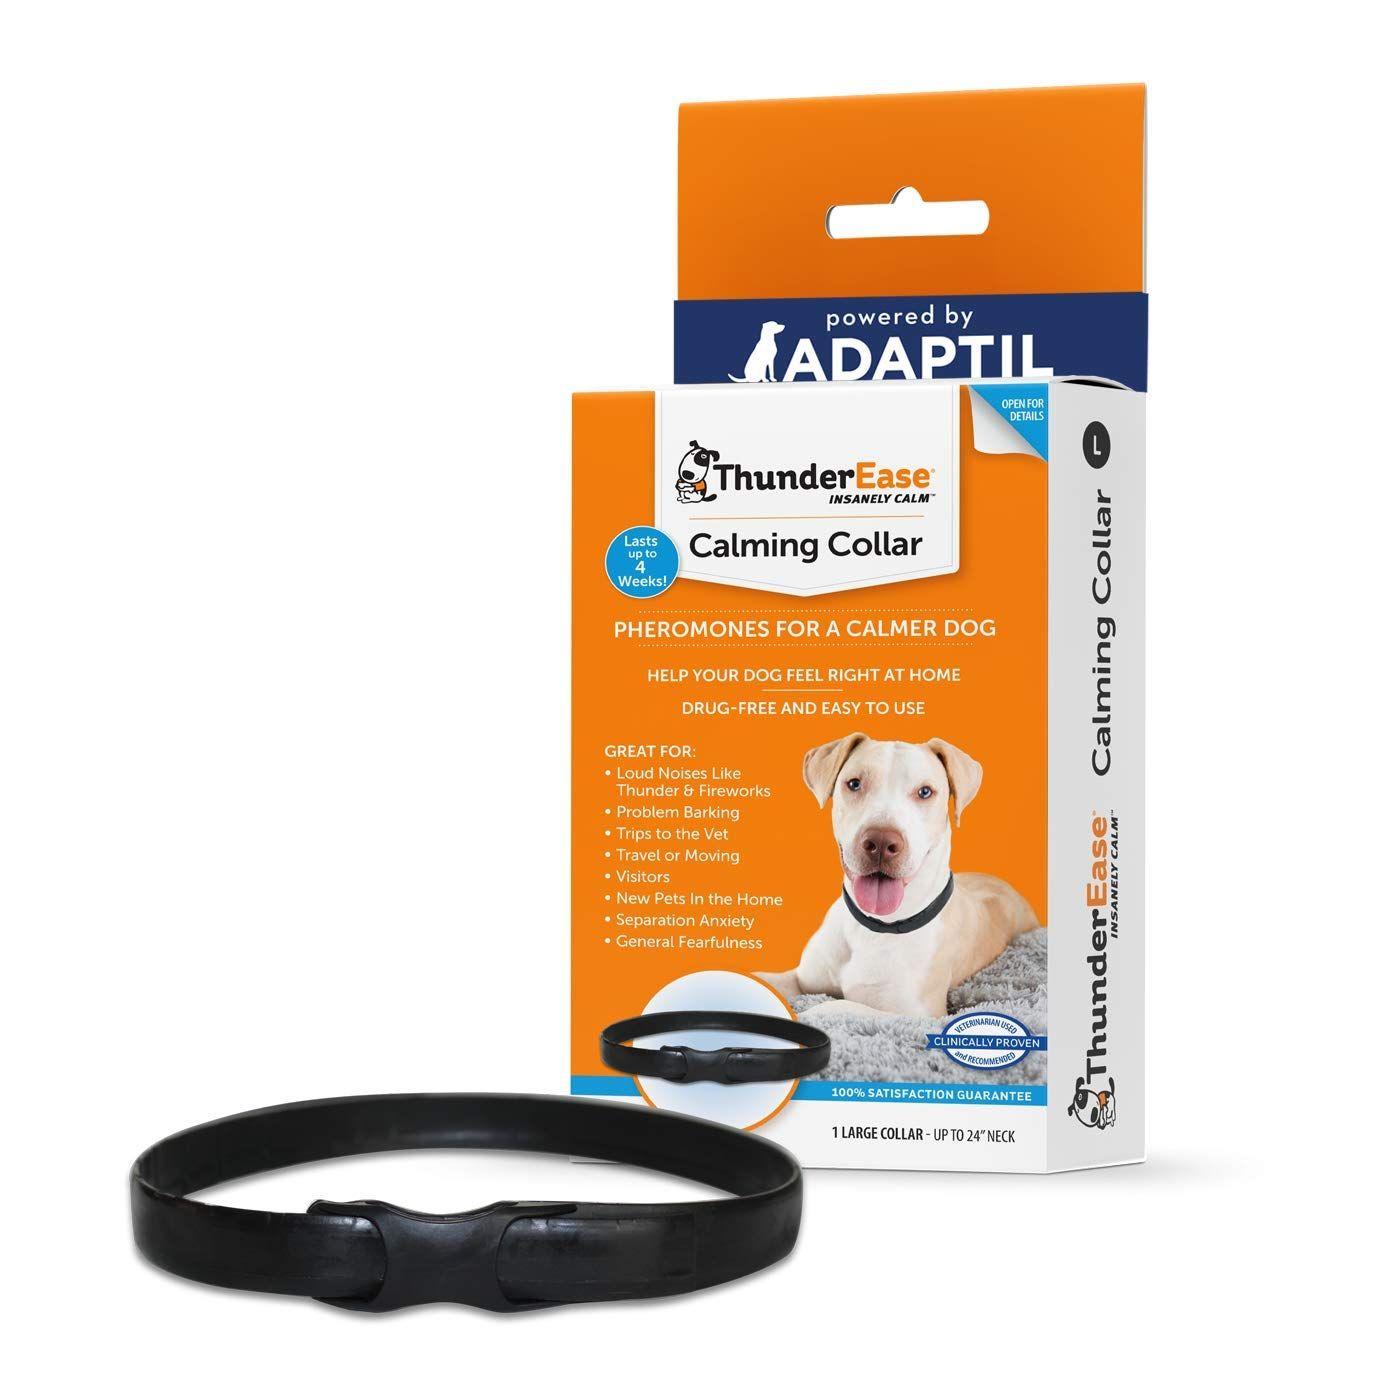 300 Cat Health Supplies Ideas In 2021 Cat Health Pet Supplements Dog Supplements